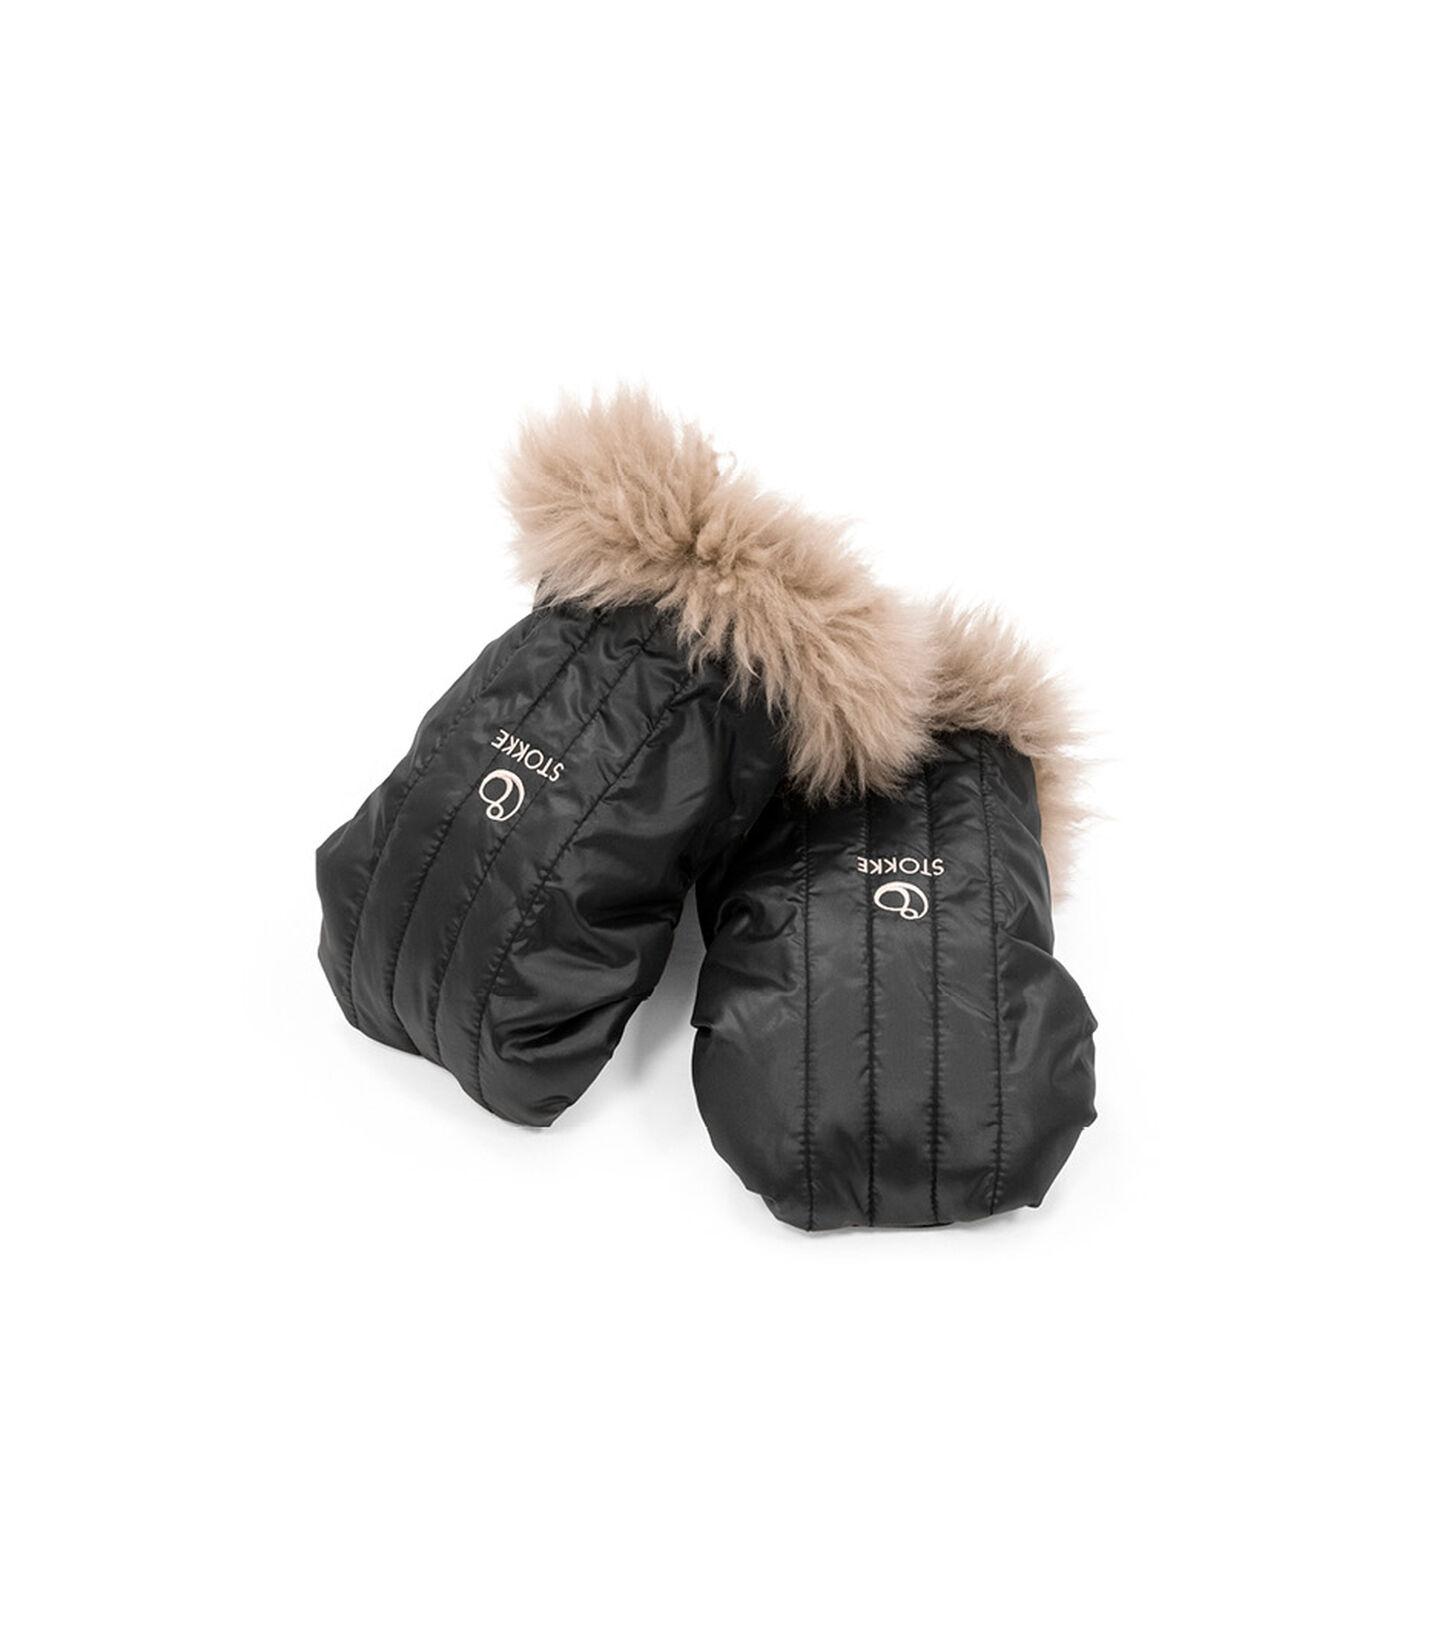 Stokke® Stroller Mittens Onyx Black, Onyx Black, mainview view 2